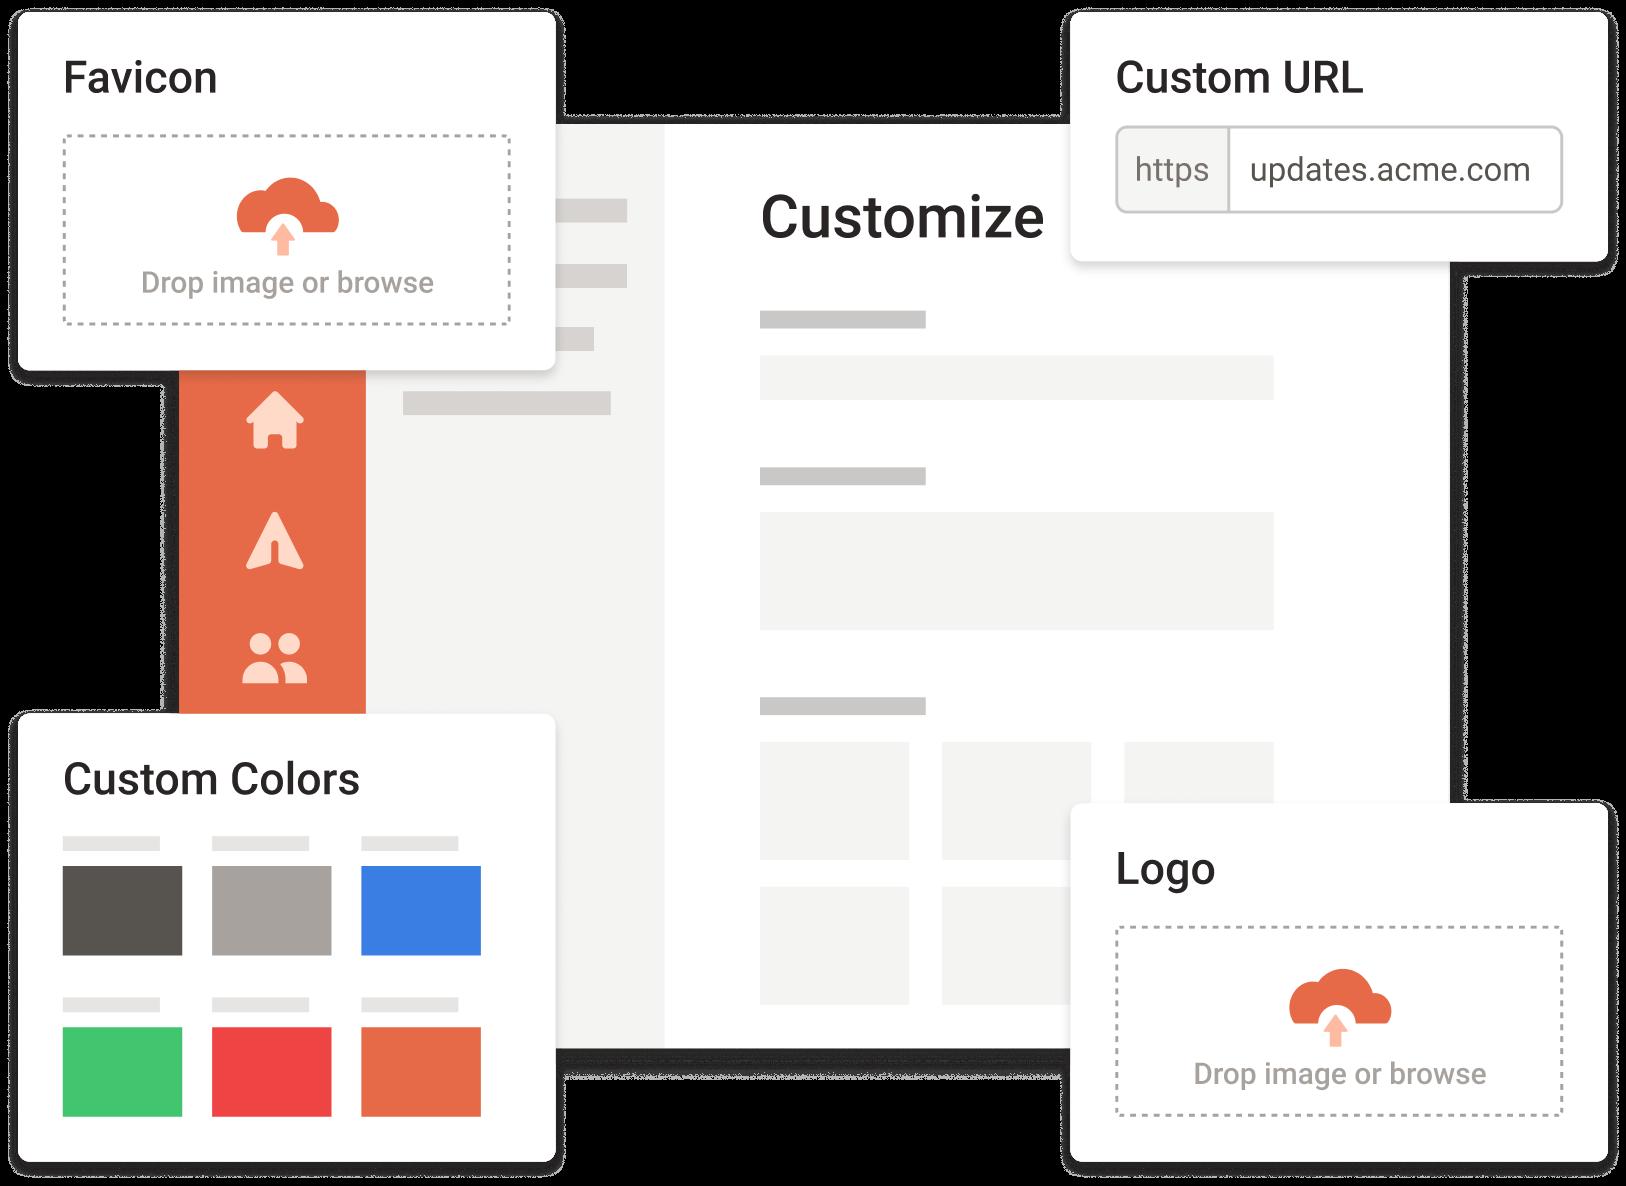 LaunchNotes customization